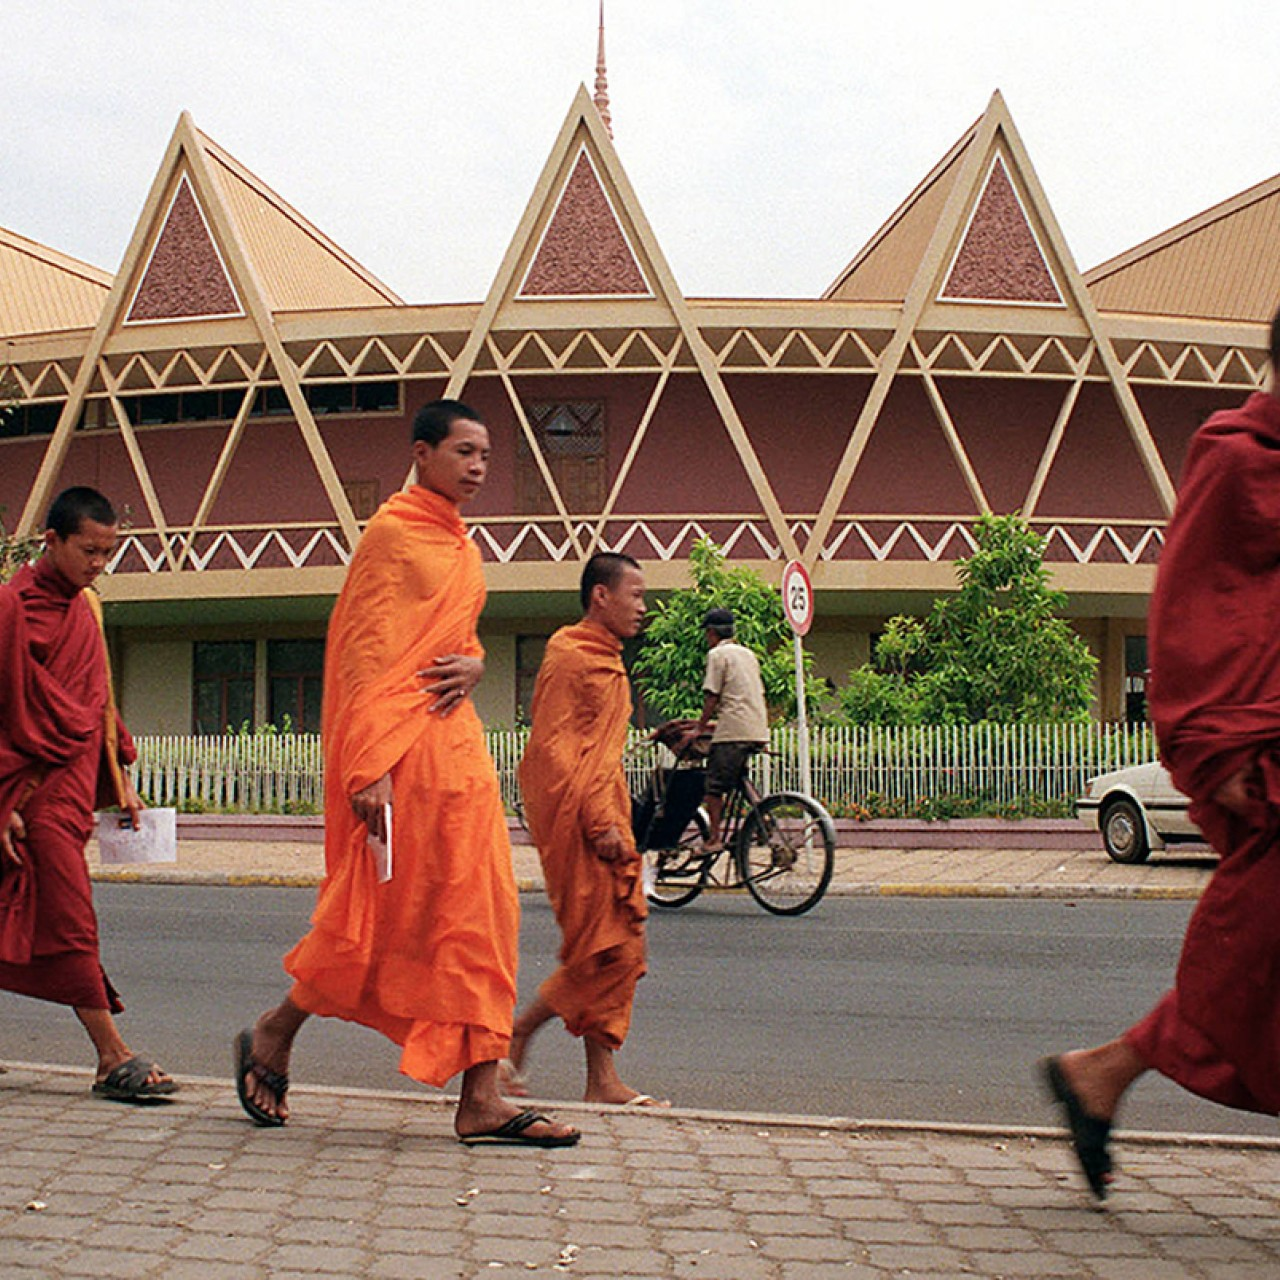 bb0366d1 Vann Molyvann: the unsung hero of Phnom Penh architecture   South China  Morning Post